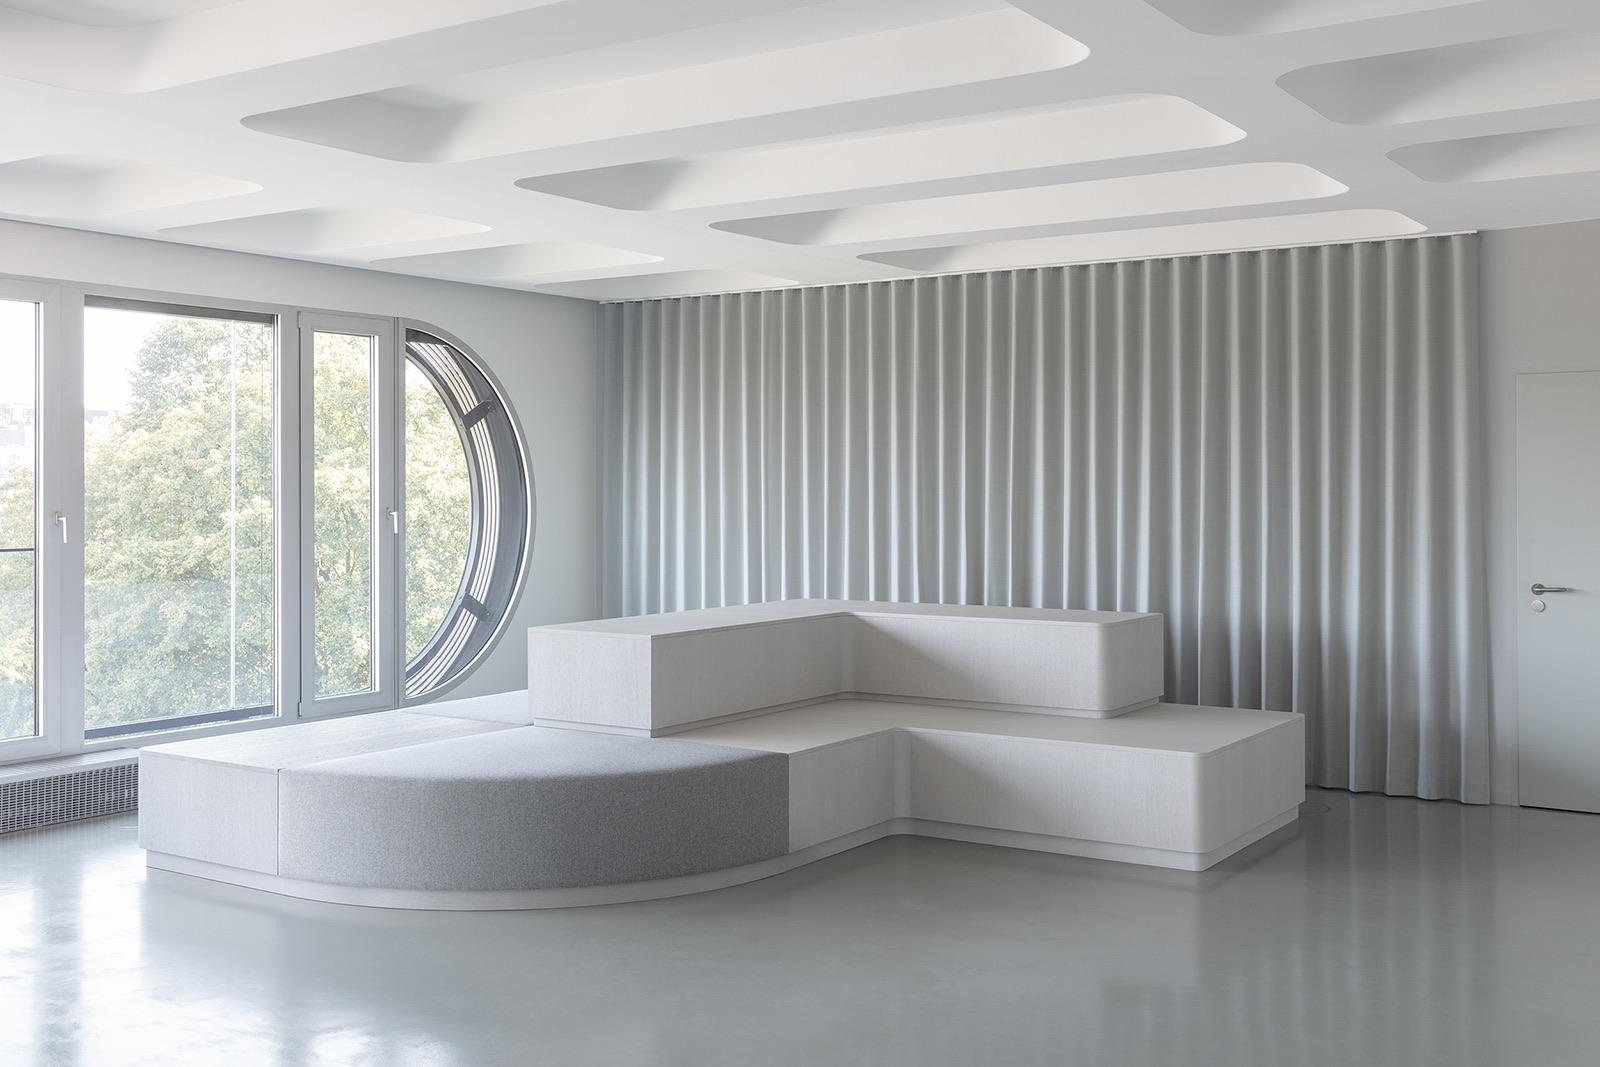 knskb-hamburg-office-4